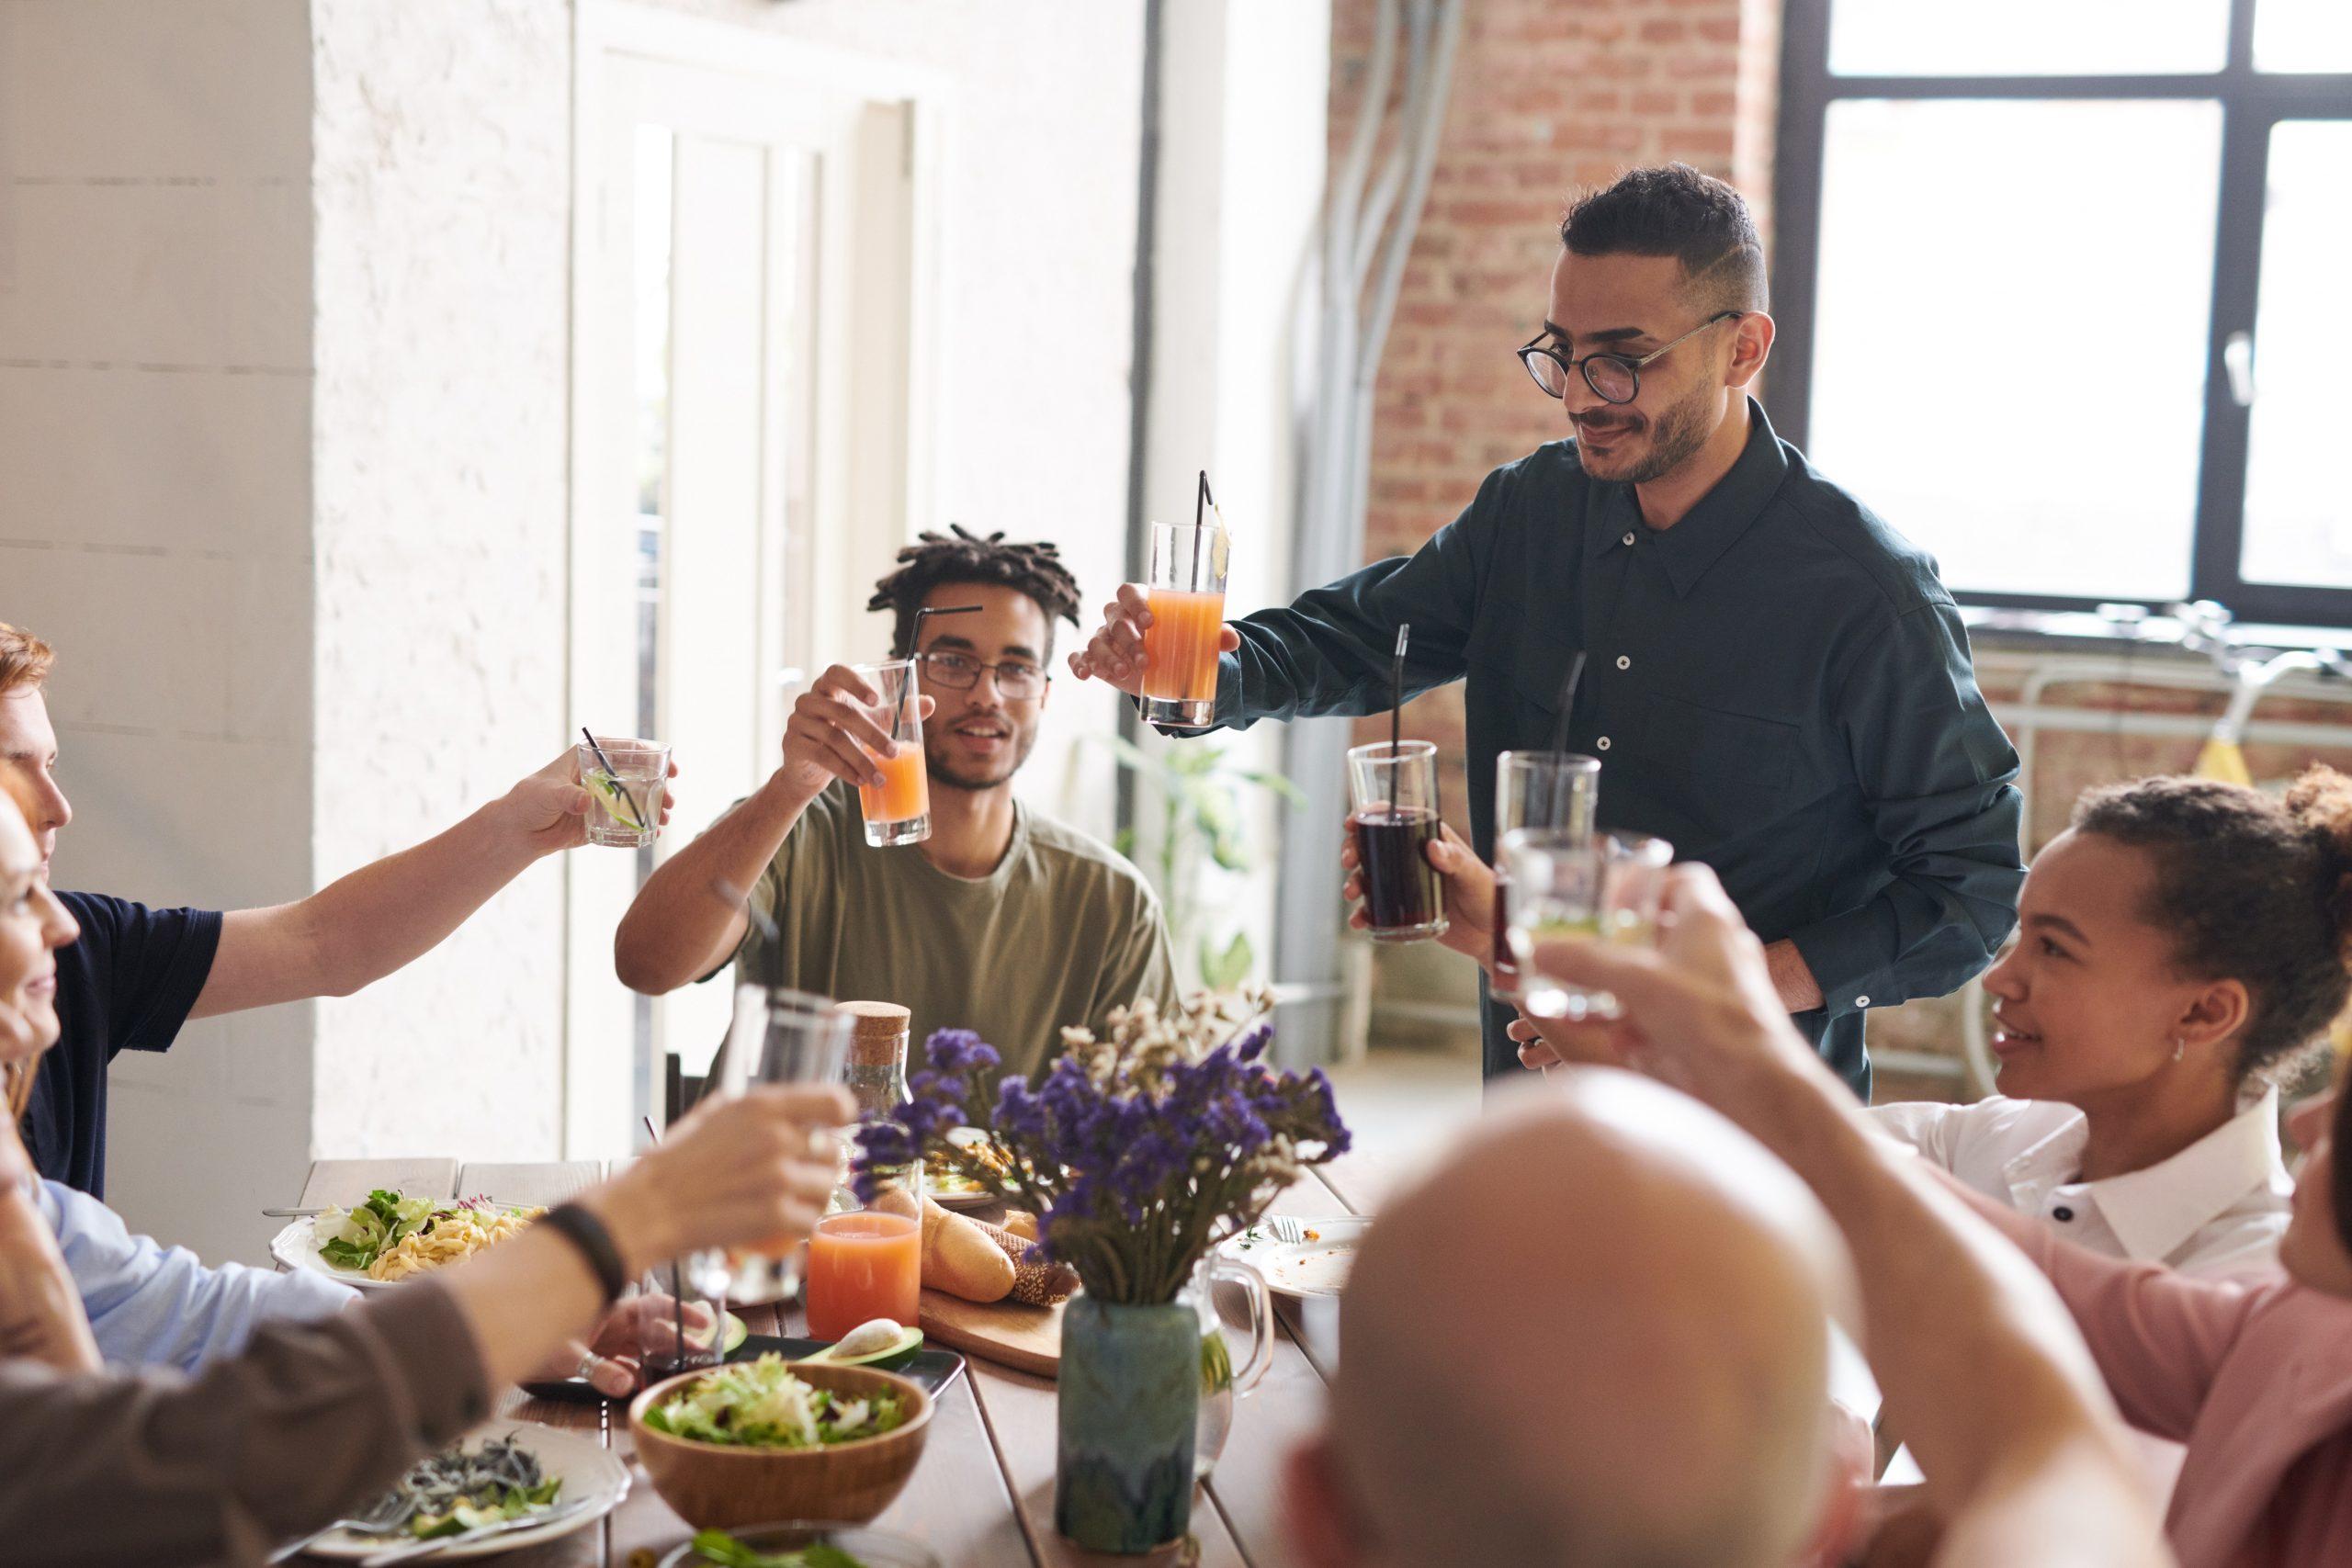 Practice gratitude on thanksgiving